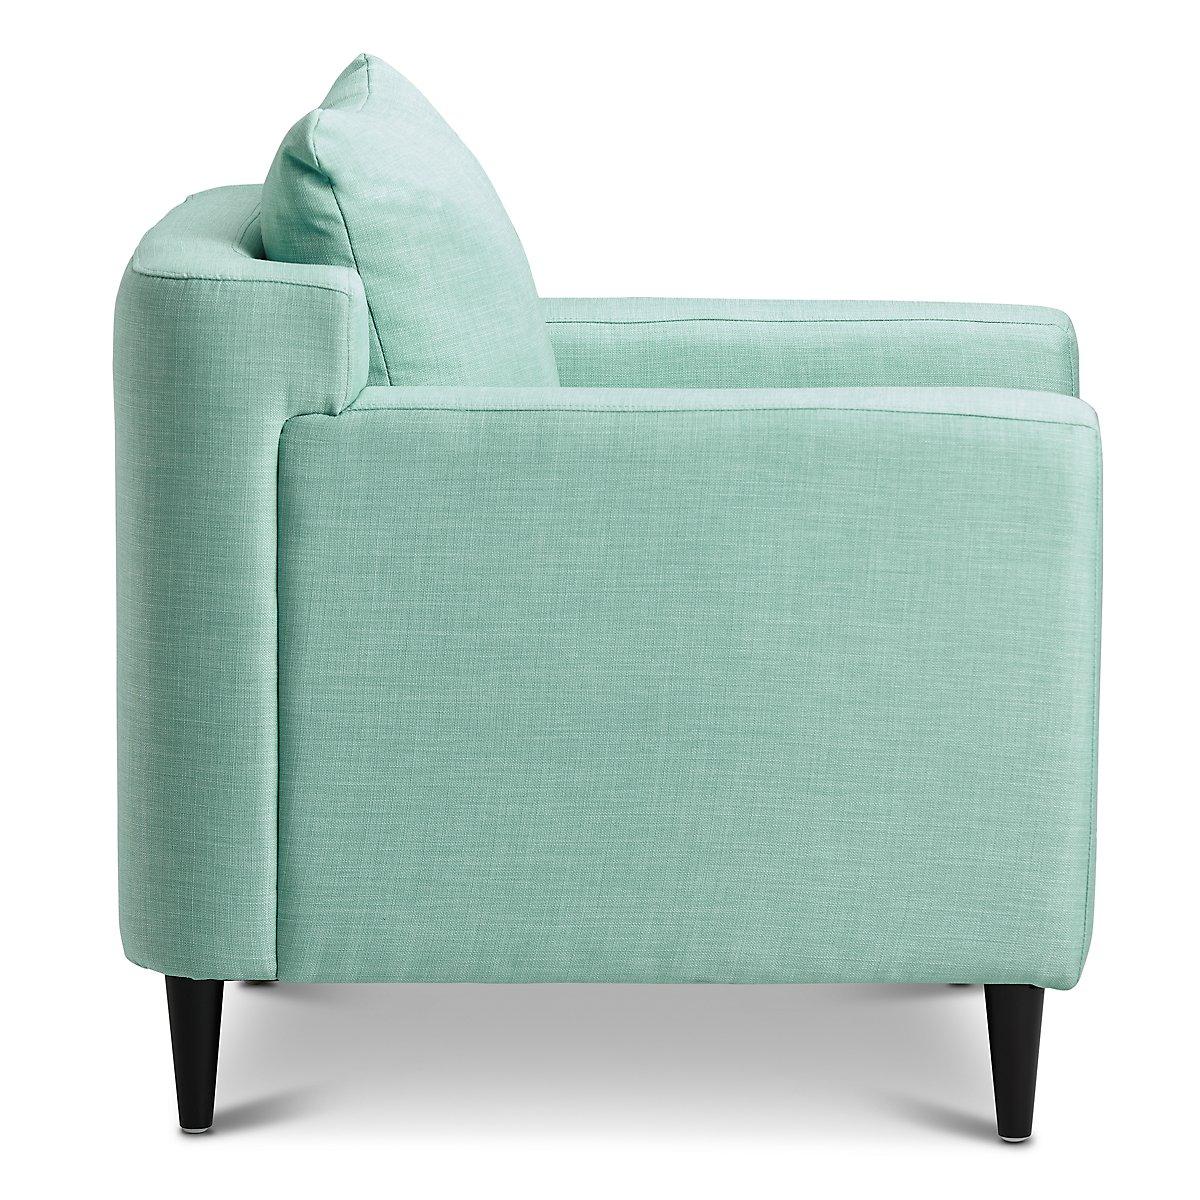 Prato Fabric Accent Chair Blue: Novara Light Blue Fabric Accent Chair